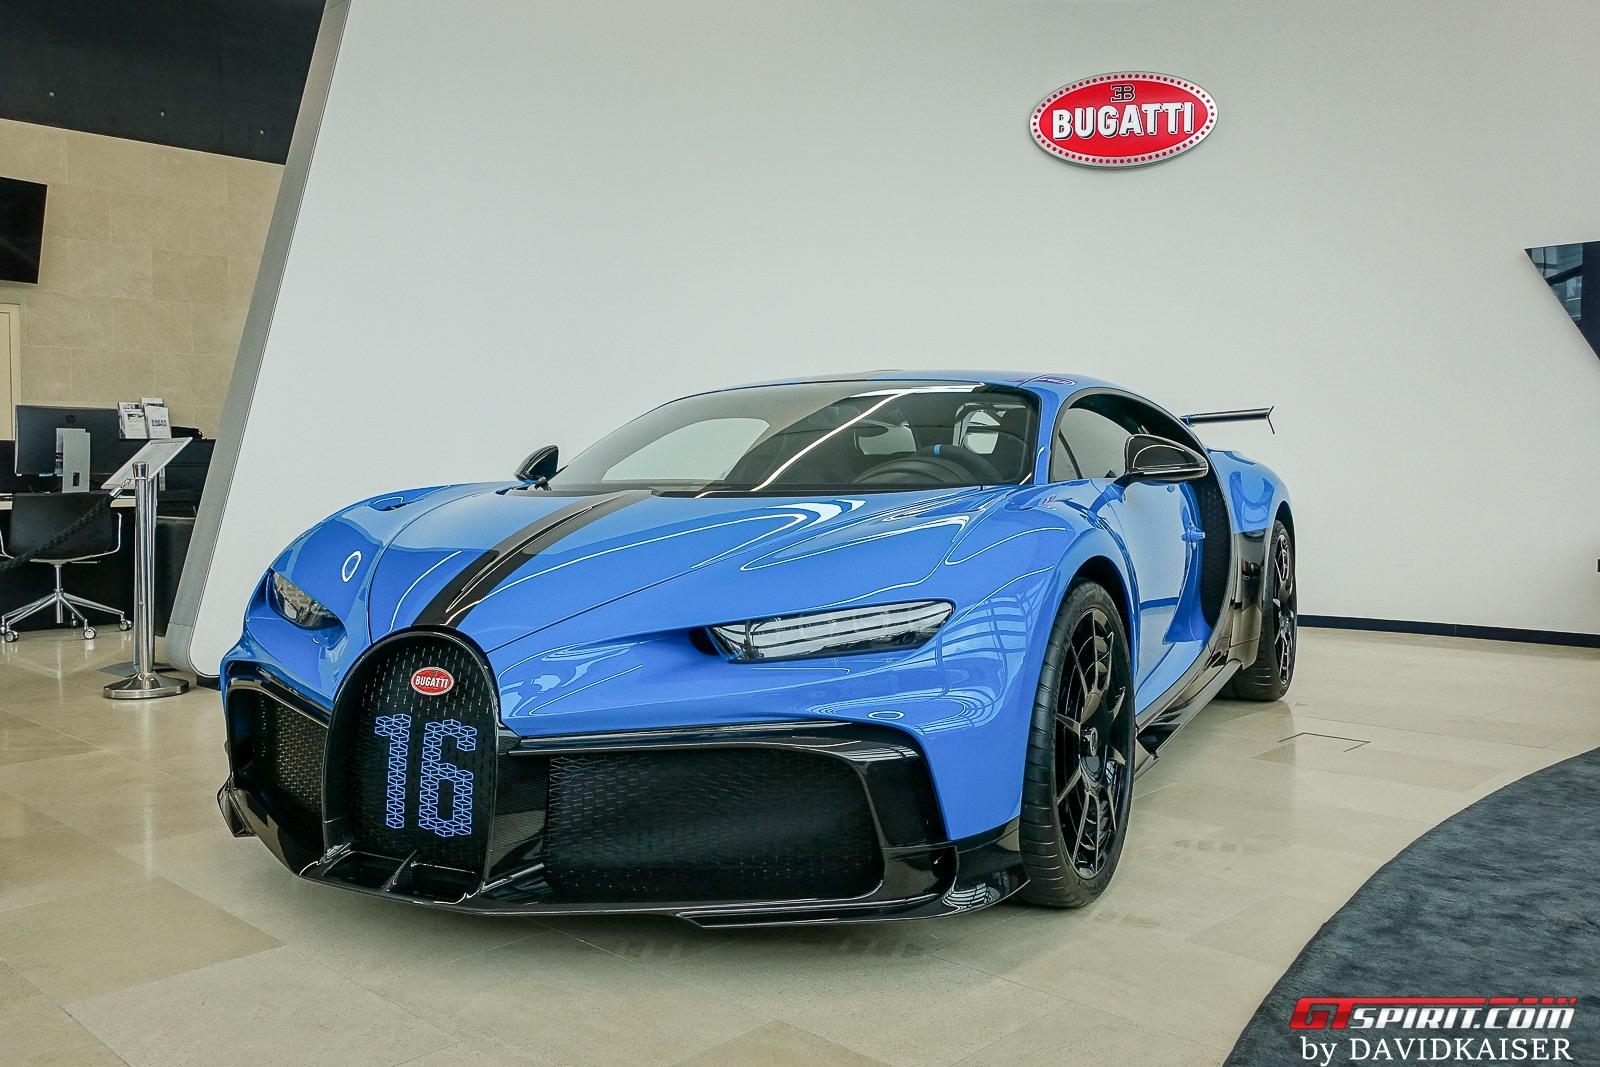 Bugatti Pur Sport in Zurich